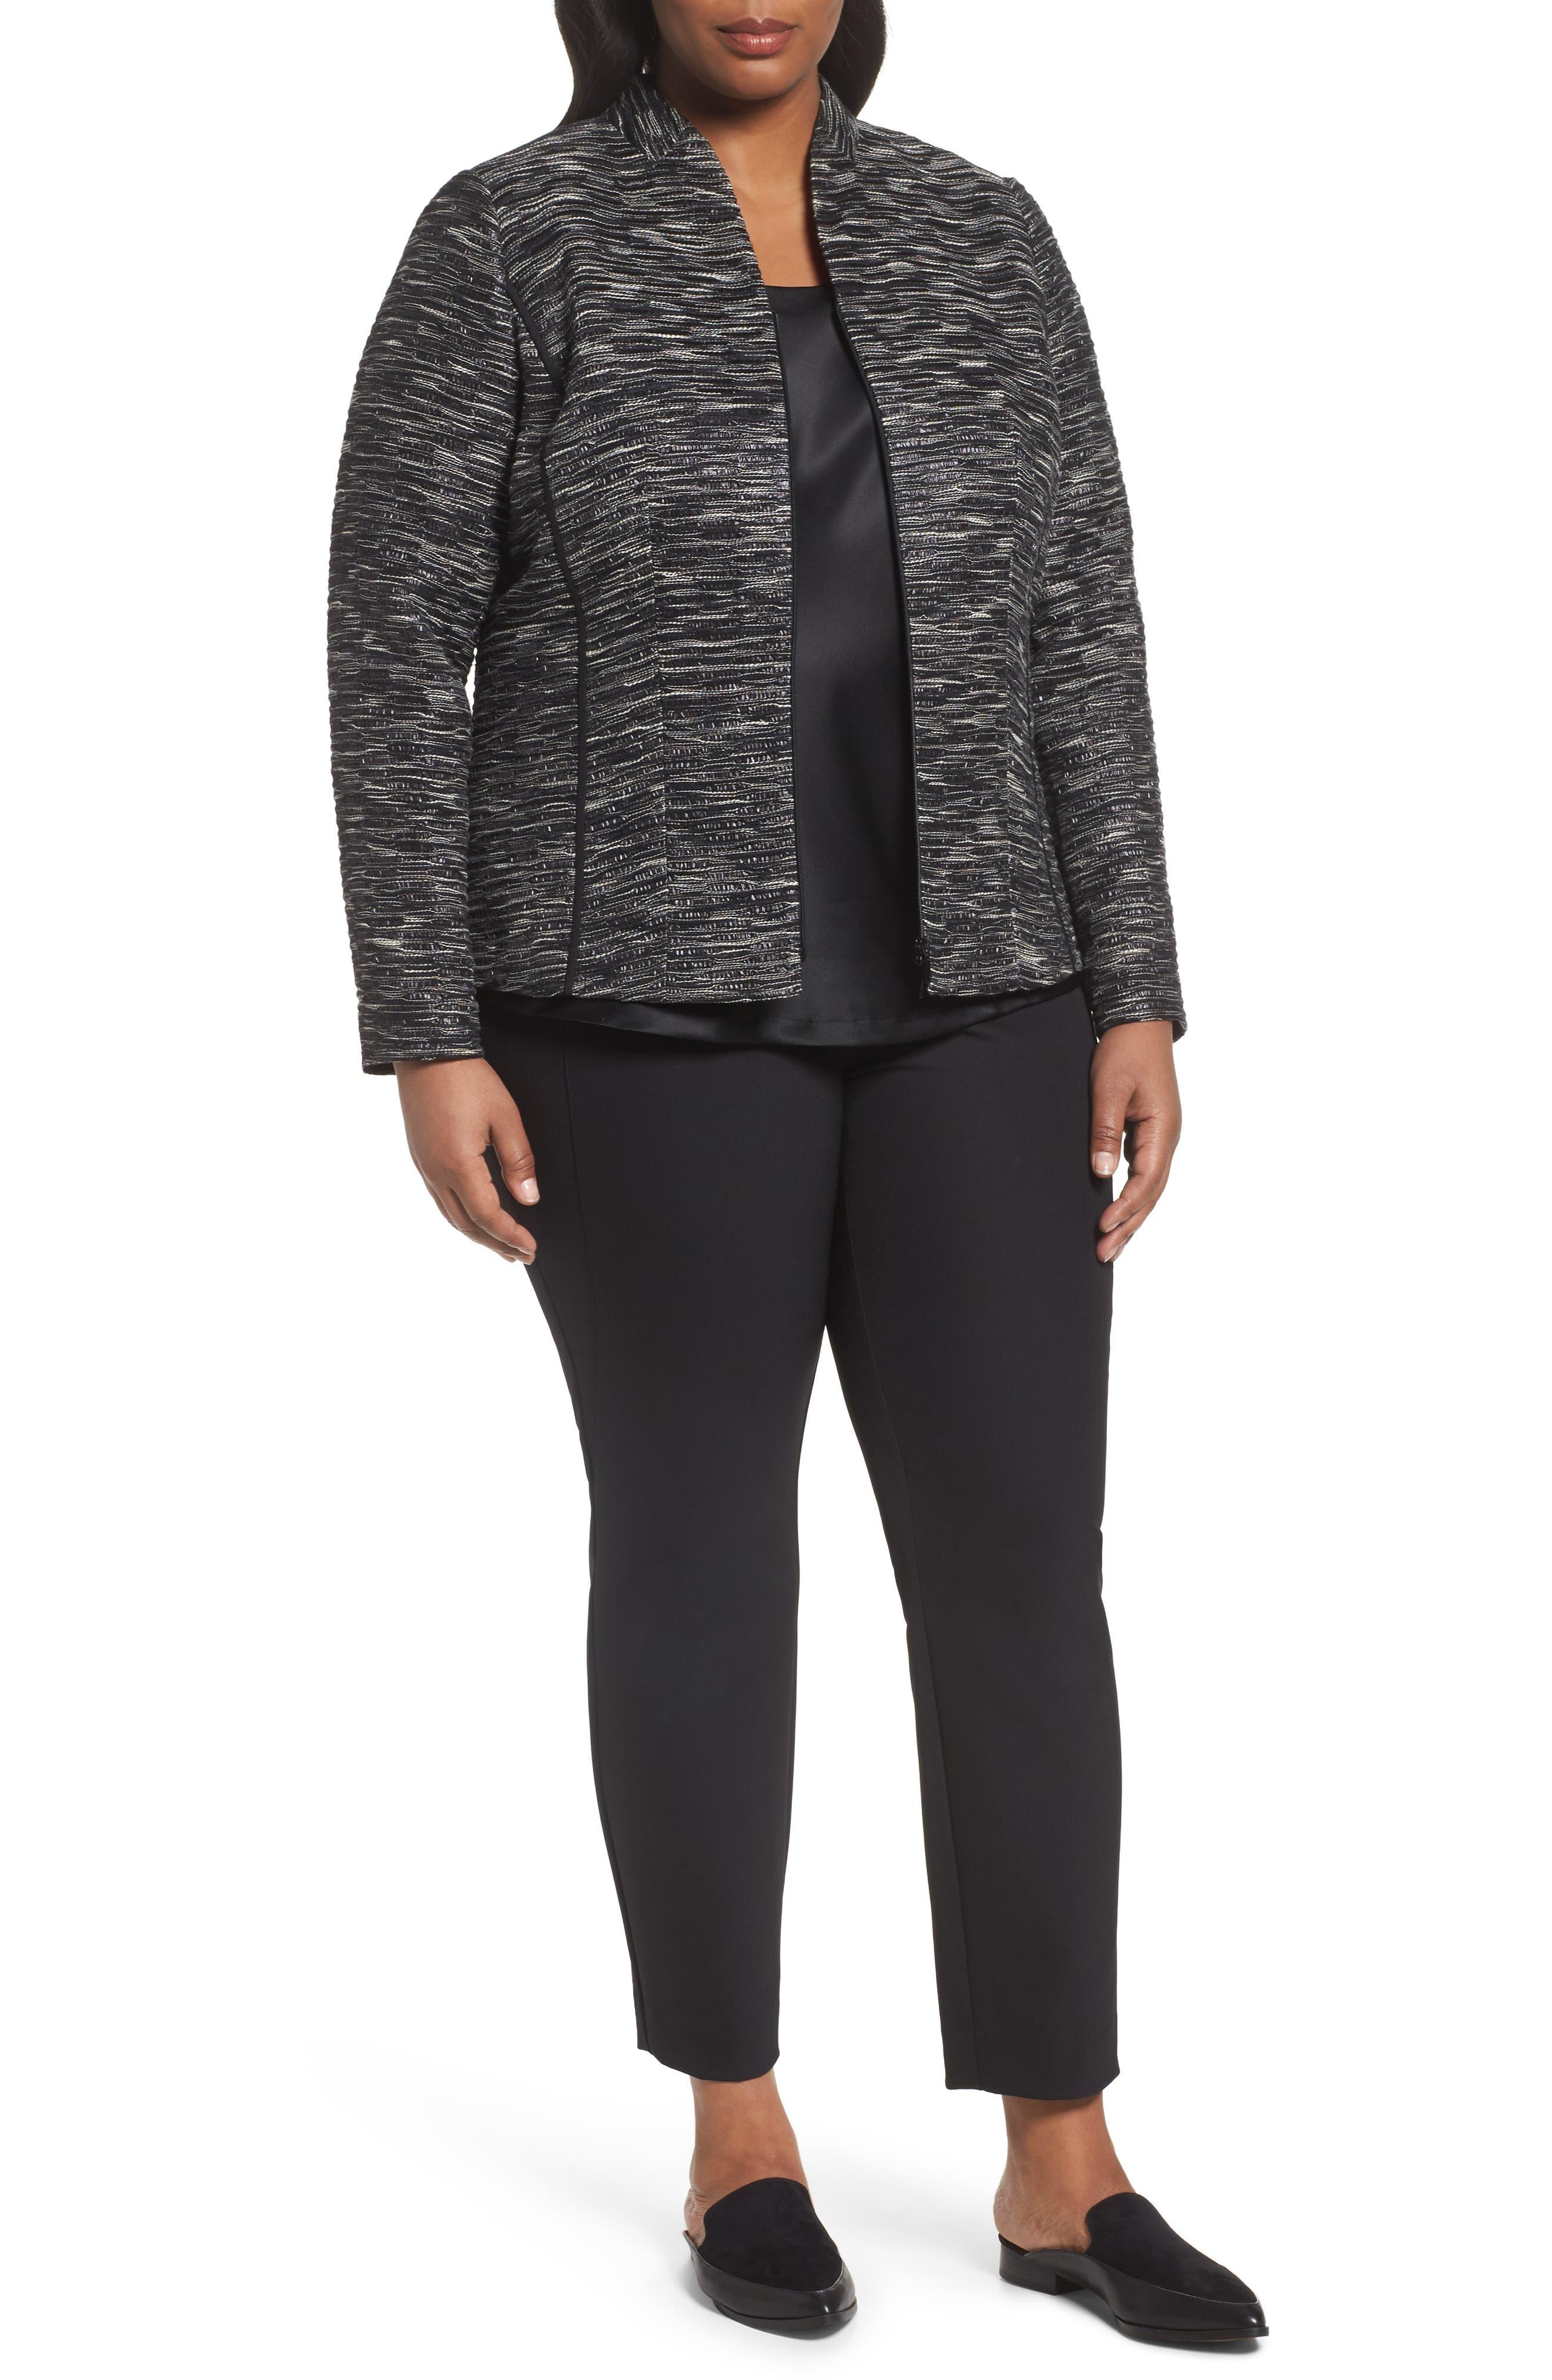 LAFAYETTE 148 NEW YORK Meryl Zip Front Jacket